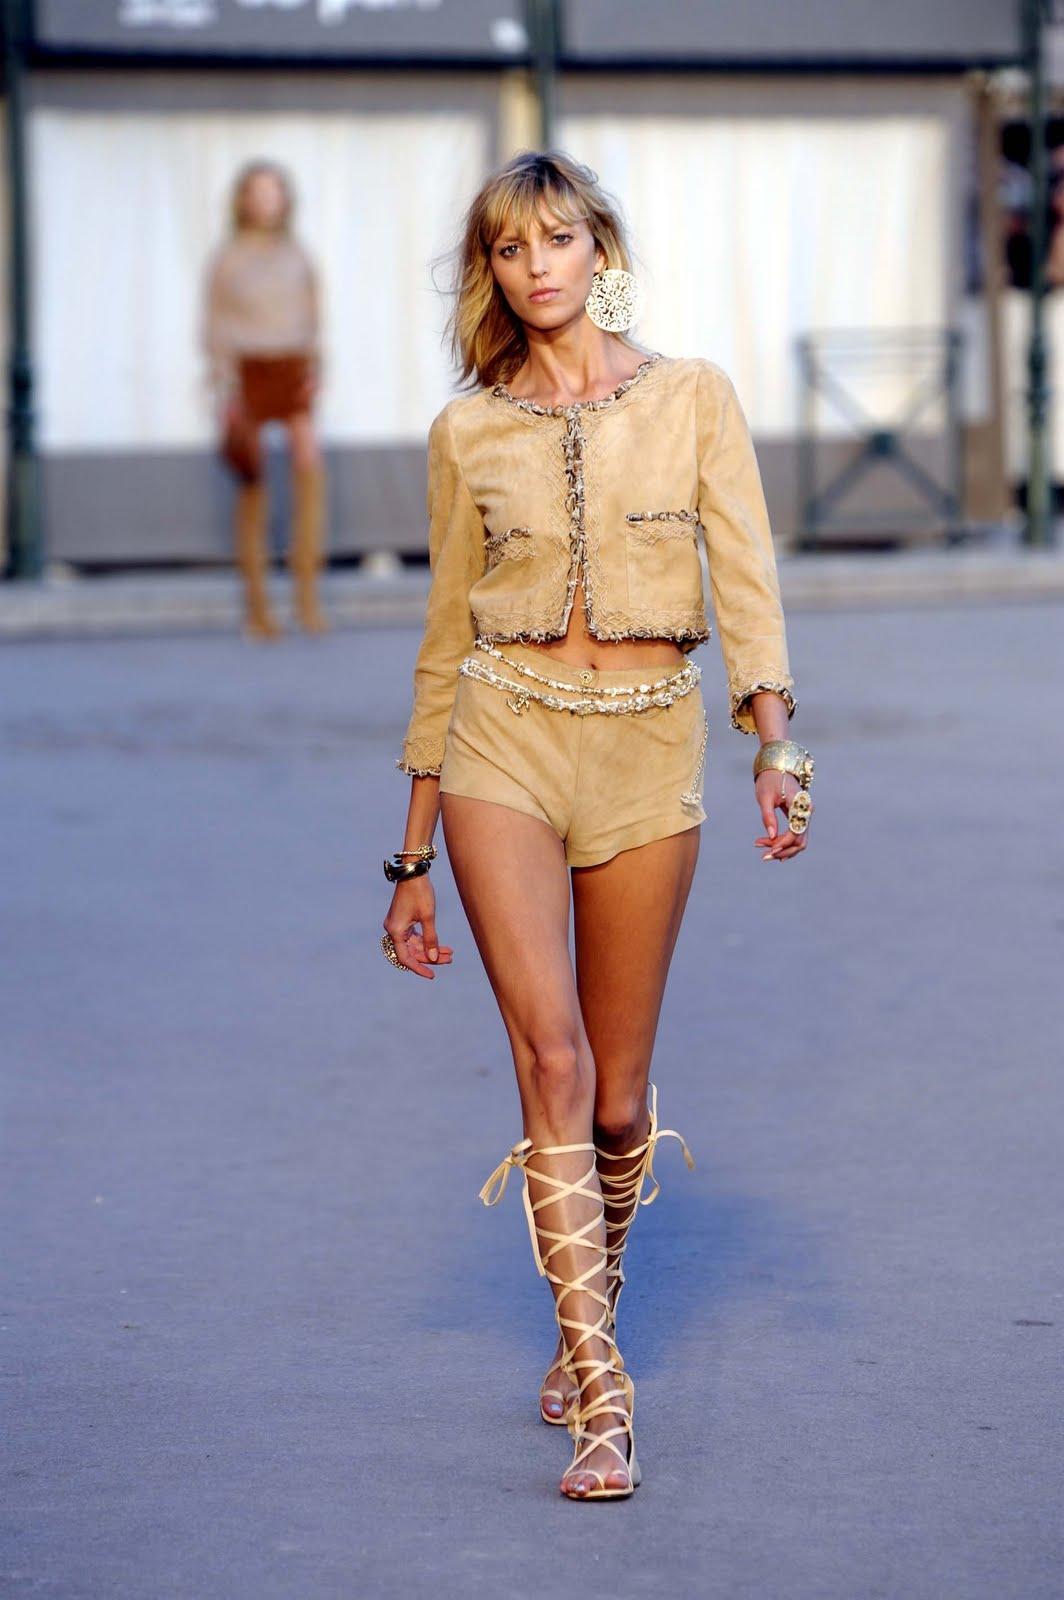 mformariza: Chanel Cruise Collection 2011